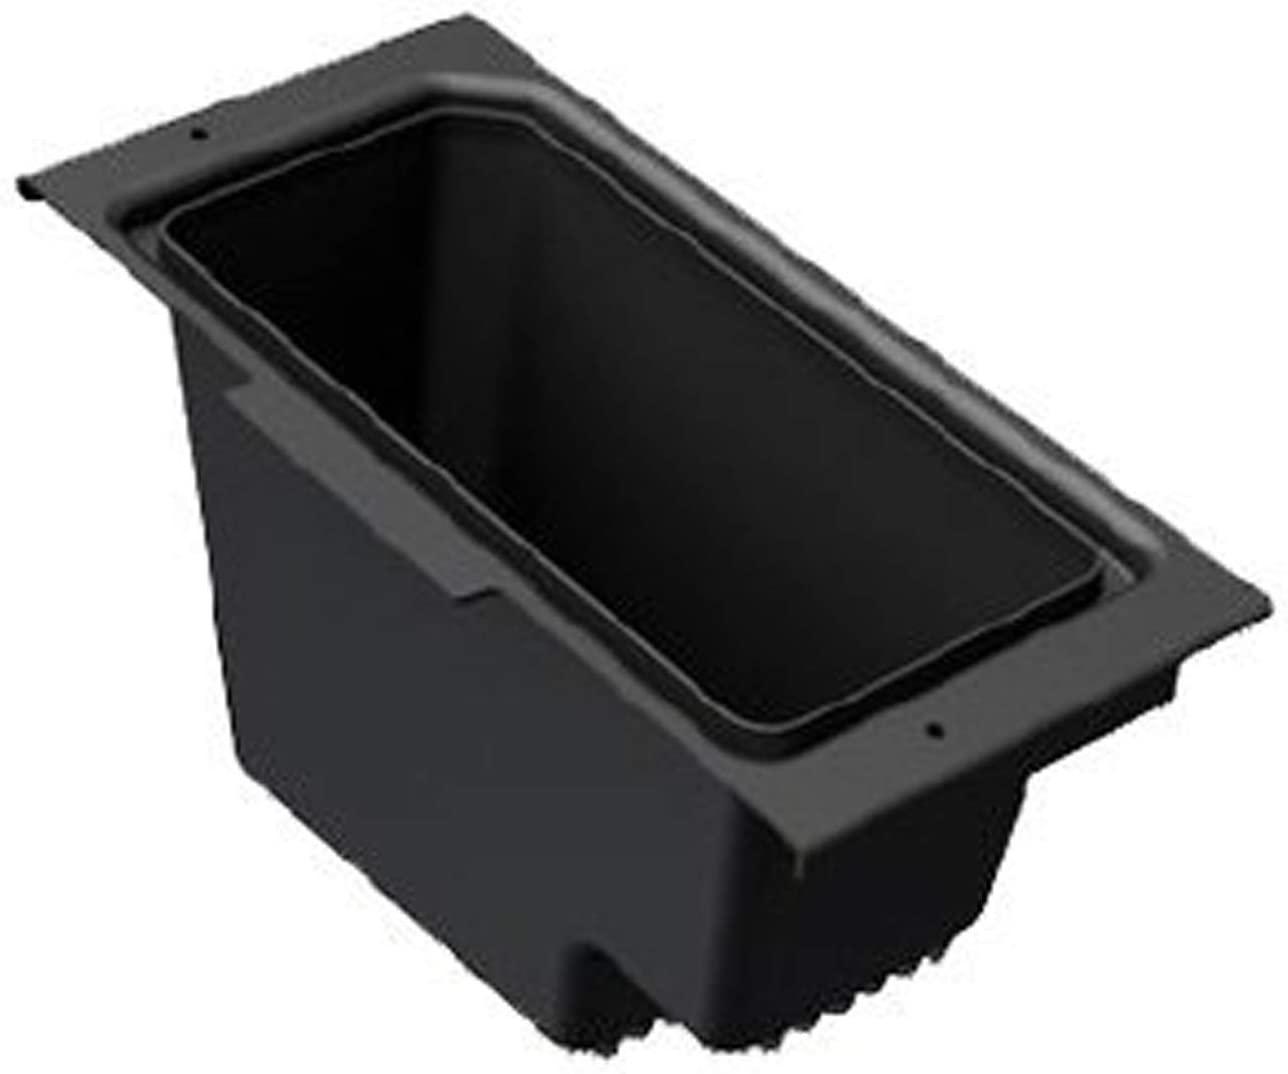 POLARIS RANGER UNDER SEAT STORAGE BOX 2880046